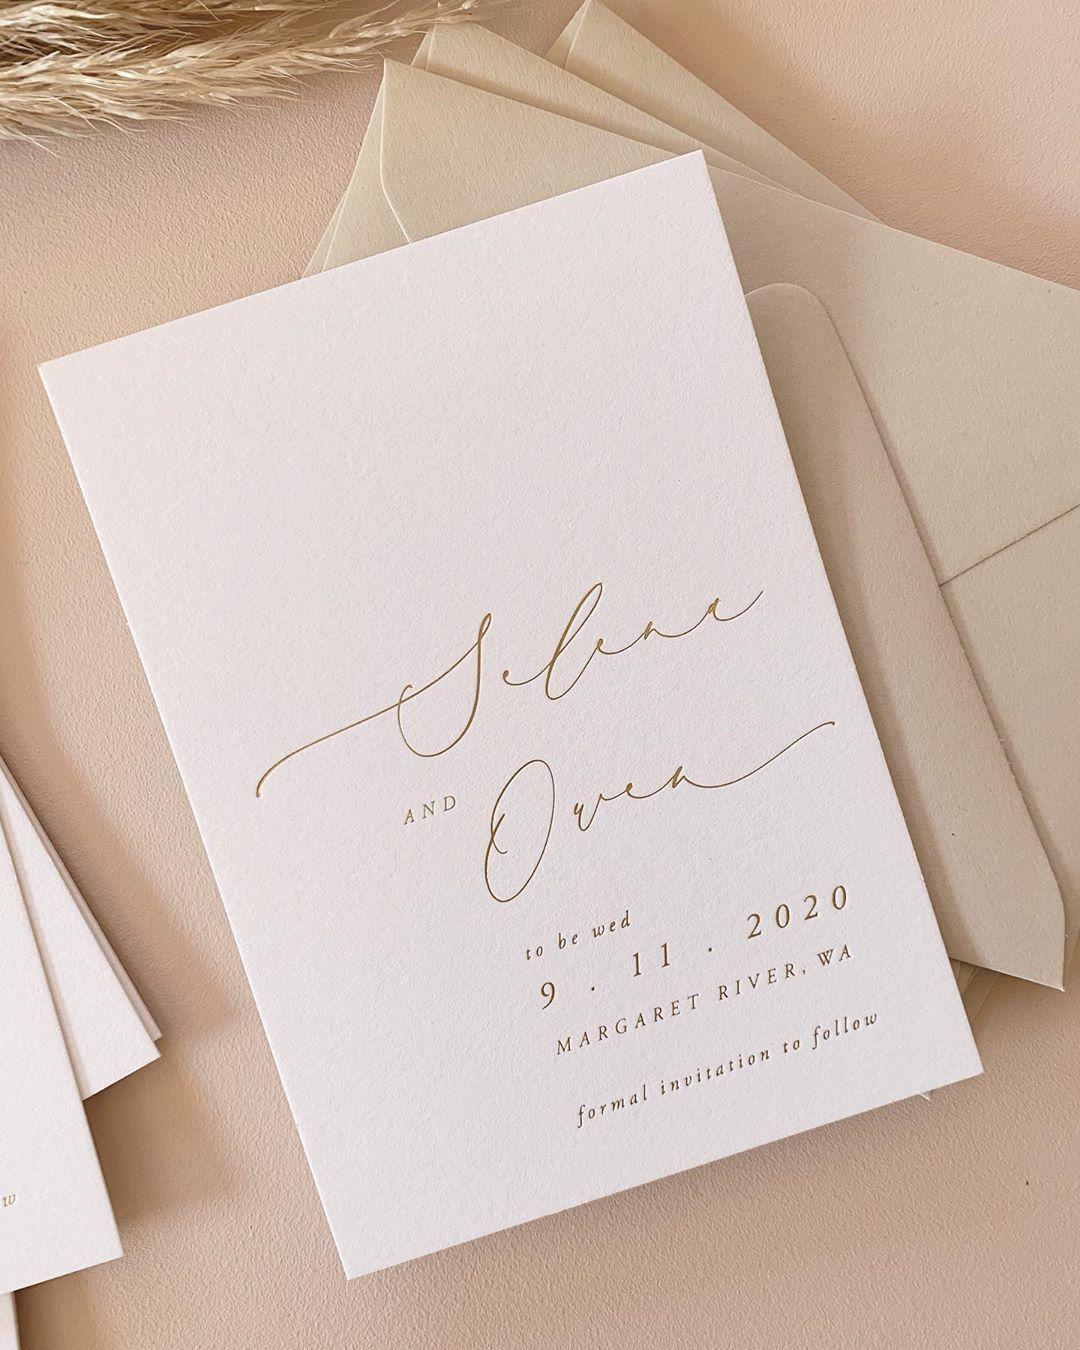 Ivory Stone On Instagram In 2020 Blush Wedding Invitations Elegant Contemporary Wedding Invitations Blush Wedding Invitations